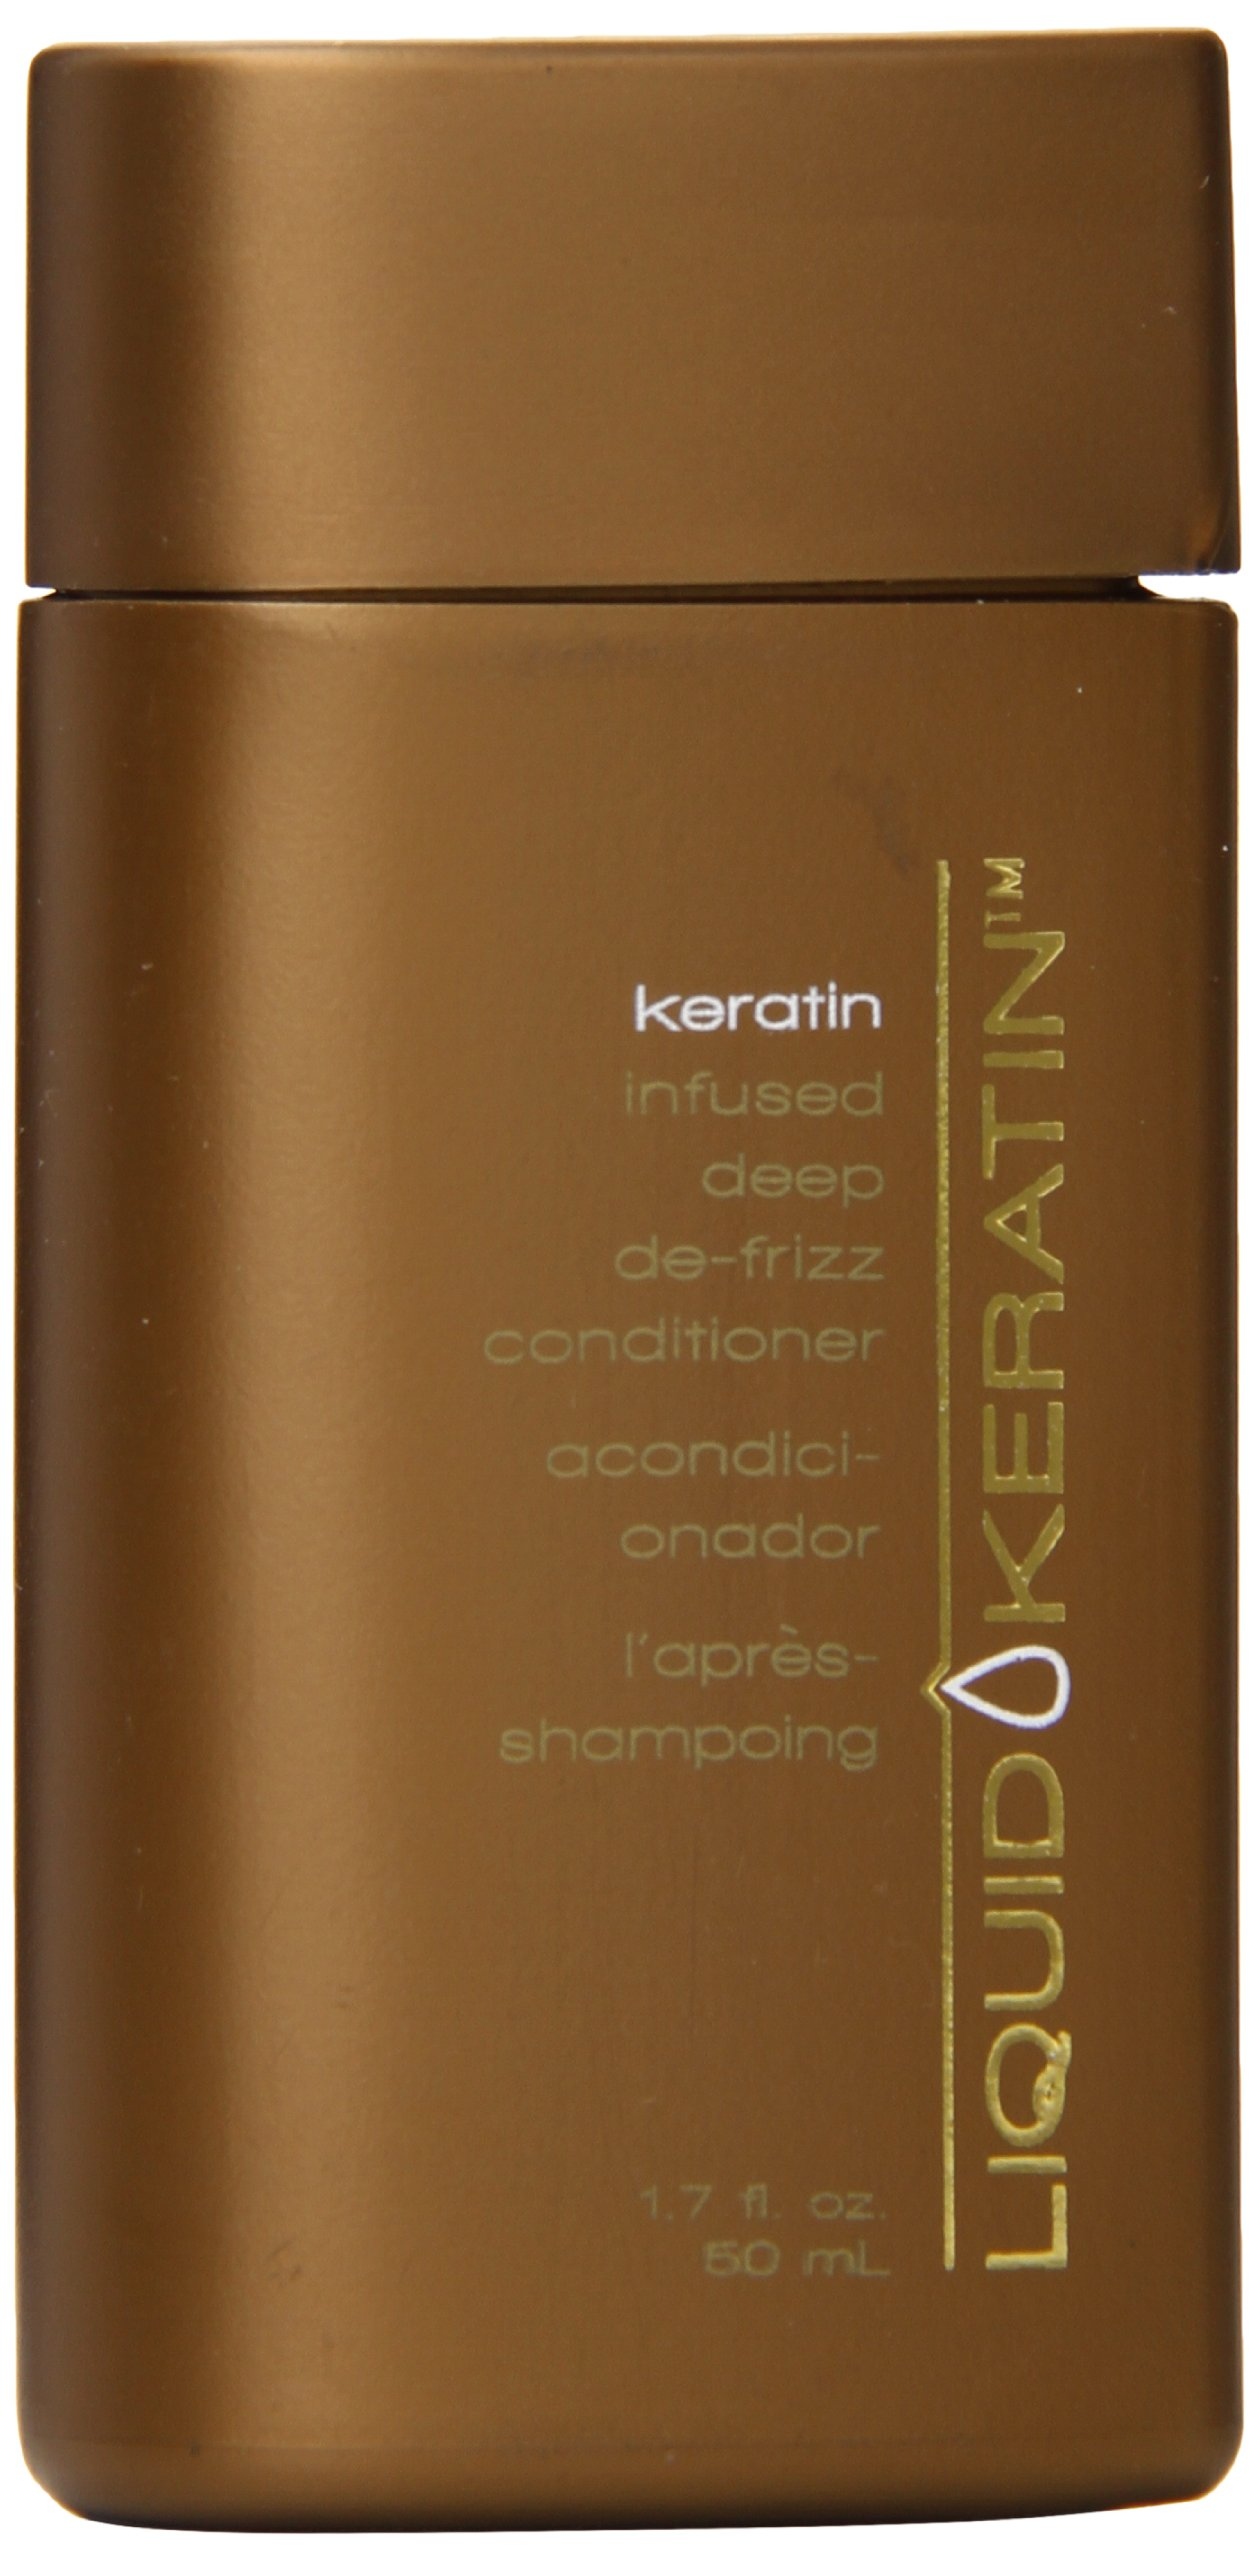 Liquid Keratin Travel Size Conditioner, 1.7 Ounce